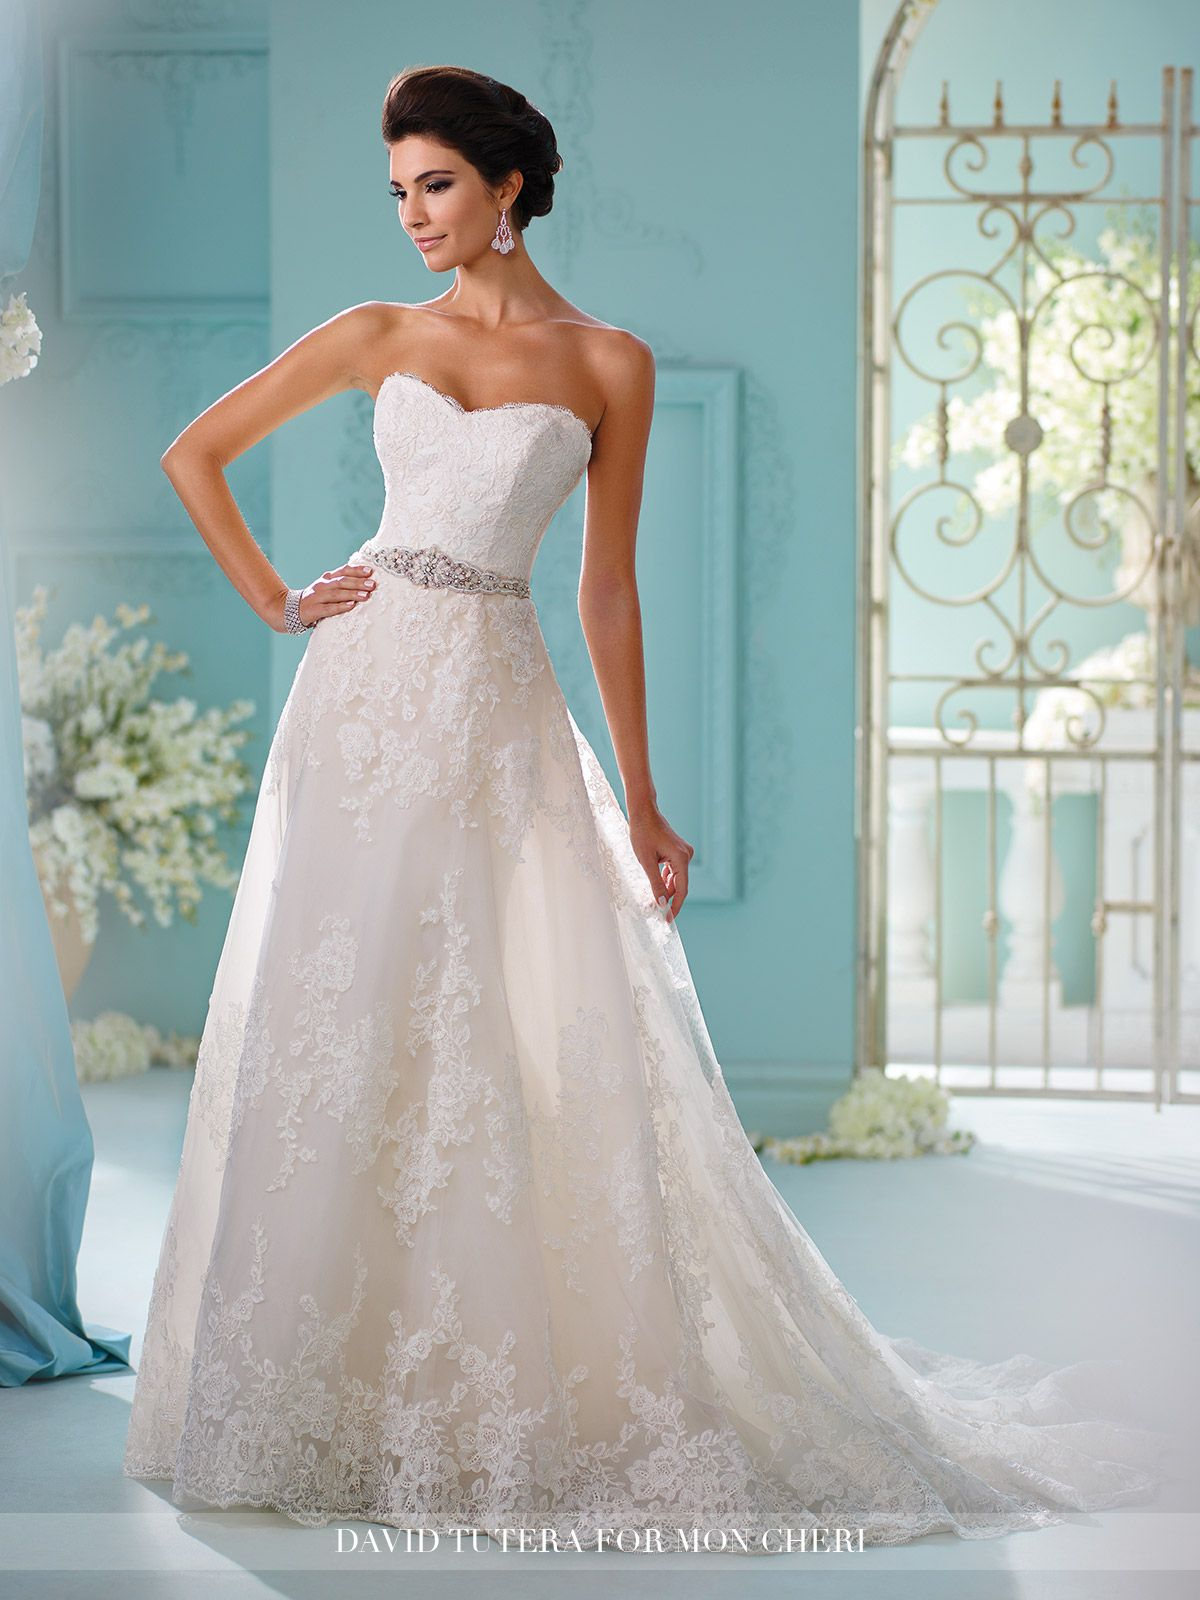 Unique Wedding Dresses Fall 2018 - Martin Thornburg | Lace applique ...